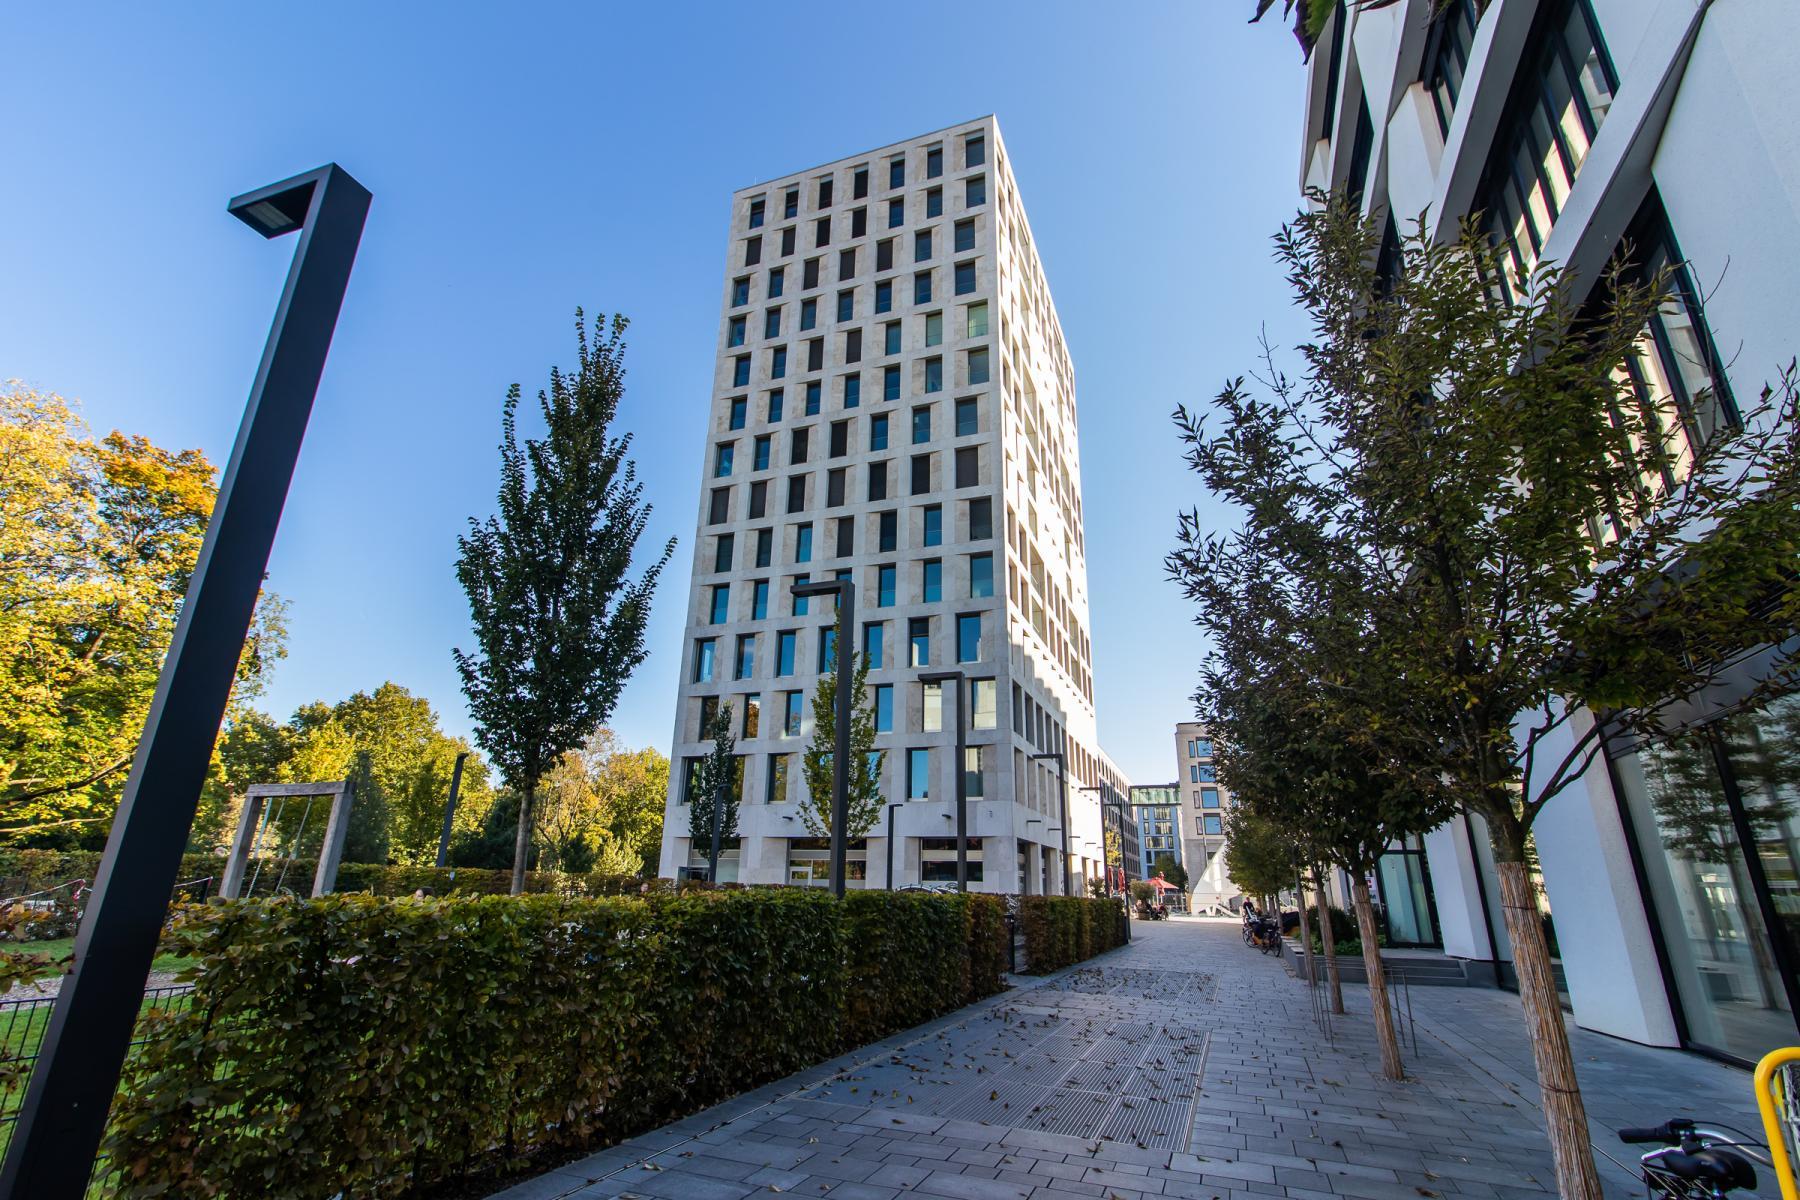 Impressive exterior view of the office building in Munich Schwabing